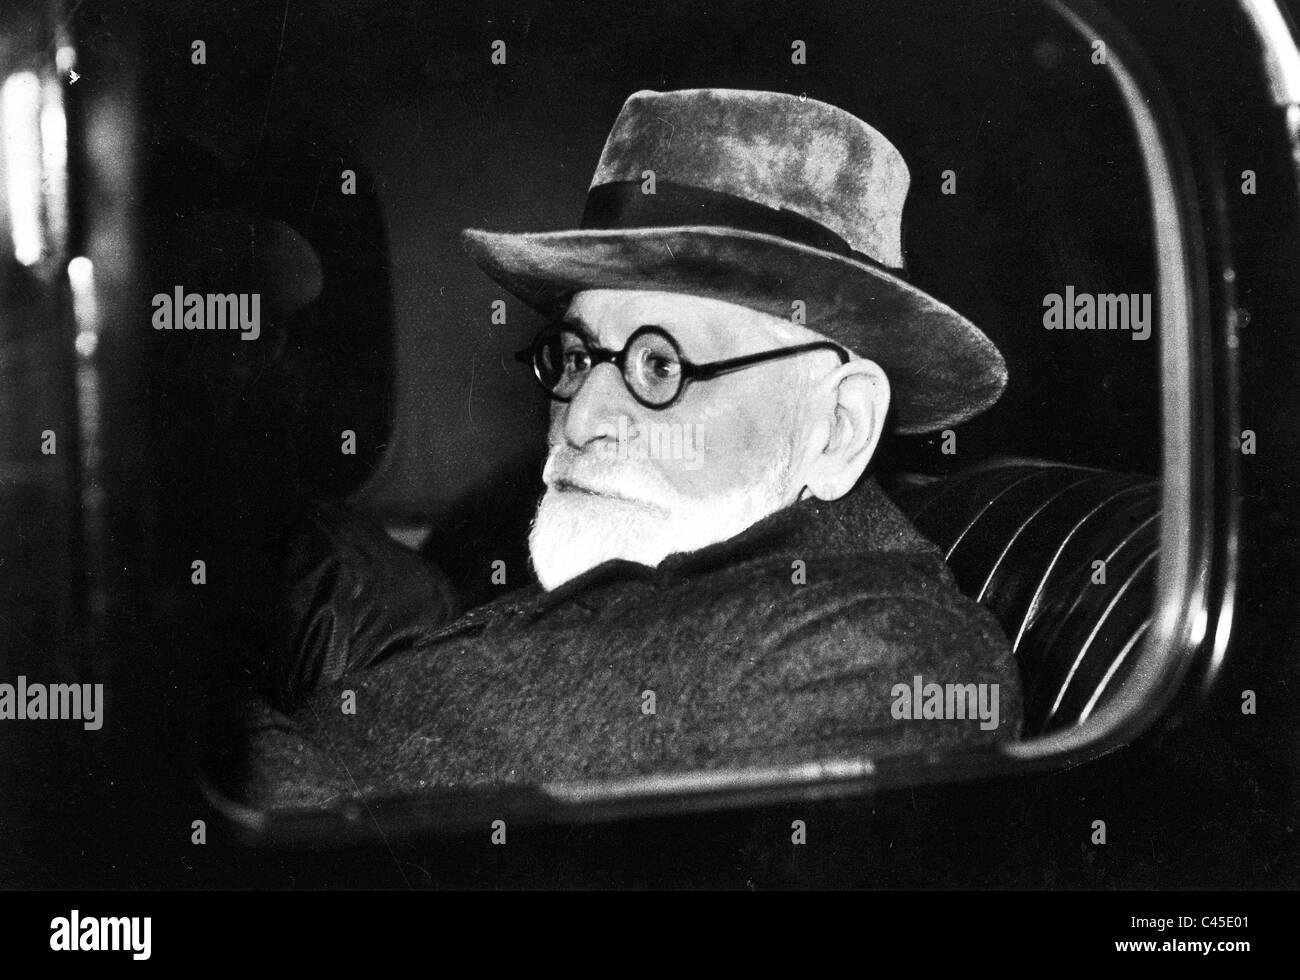 Sigmund Freud in the car, 1938 - Stock Image